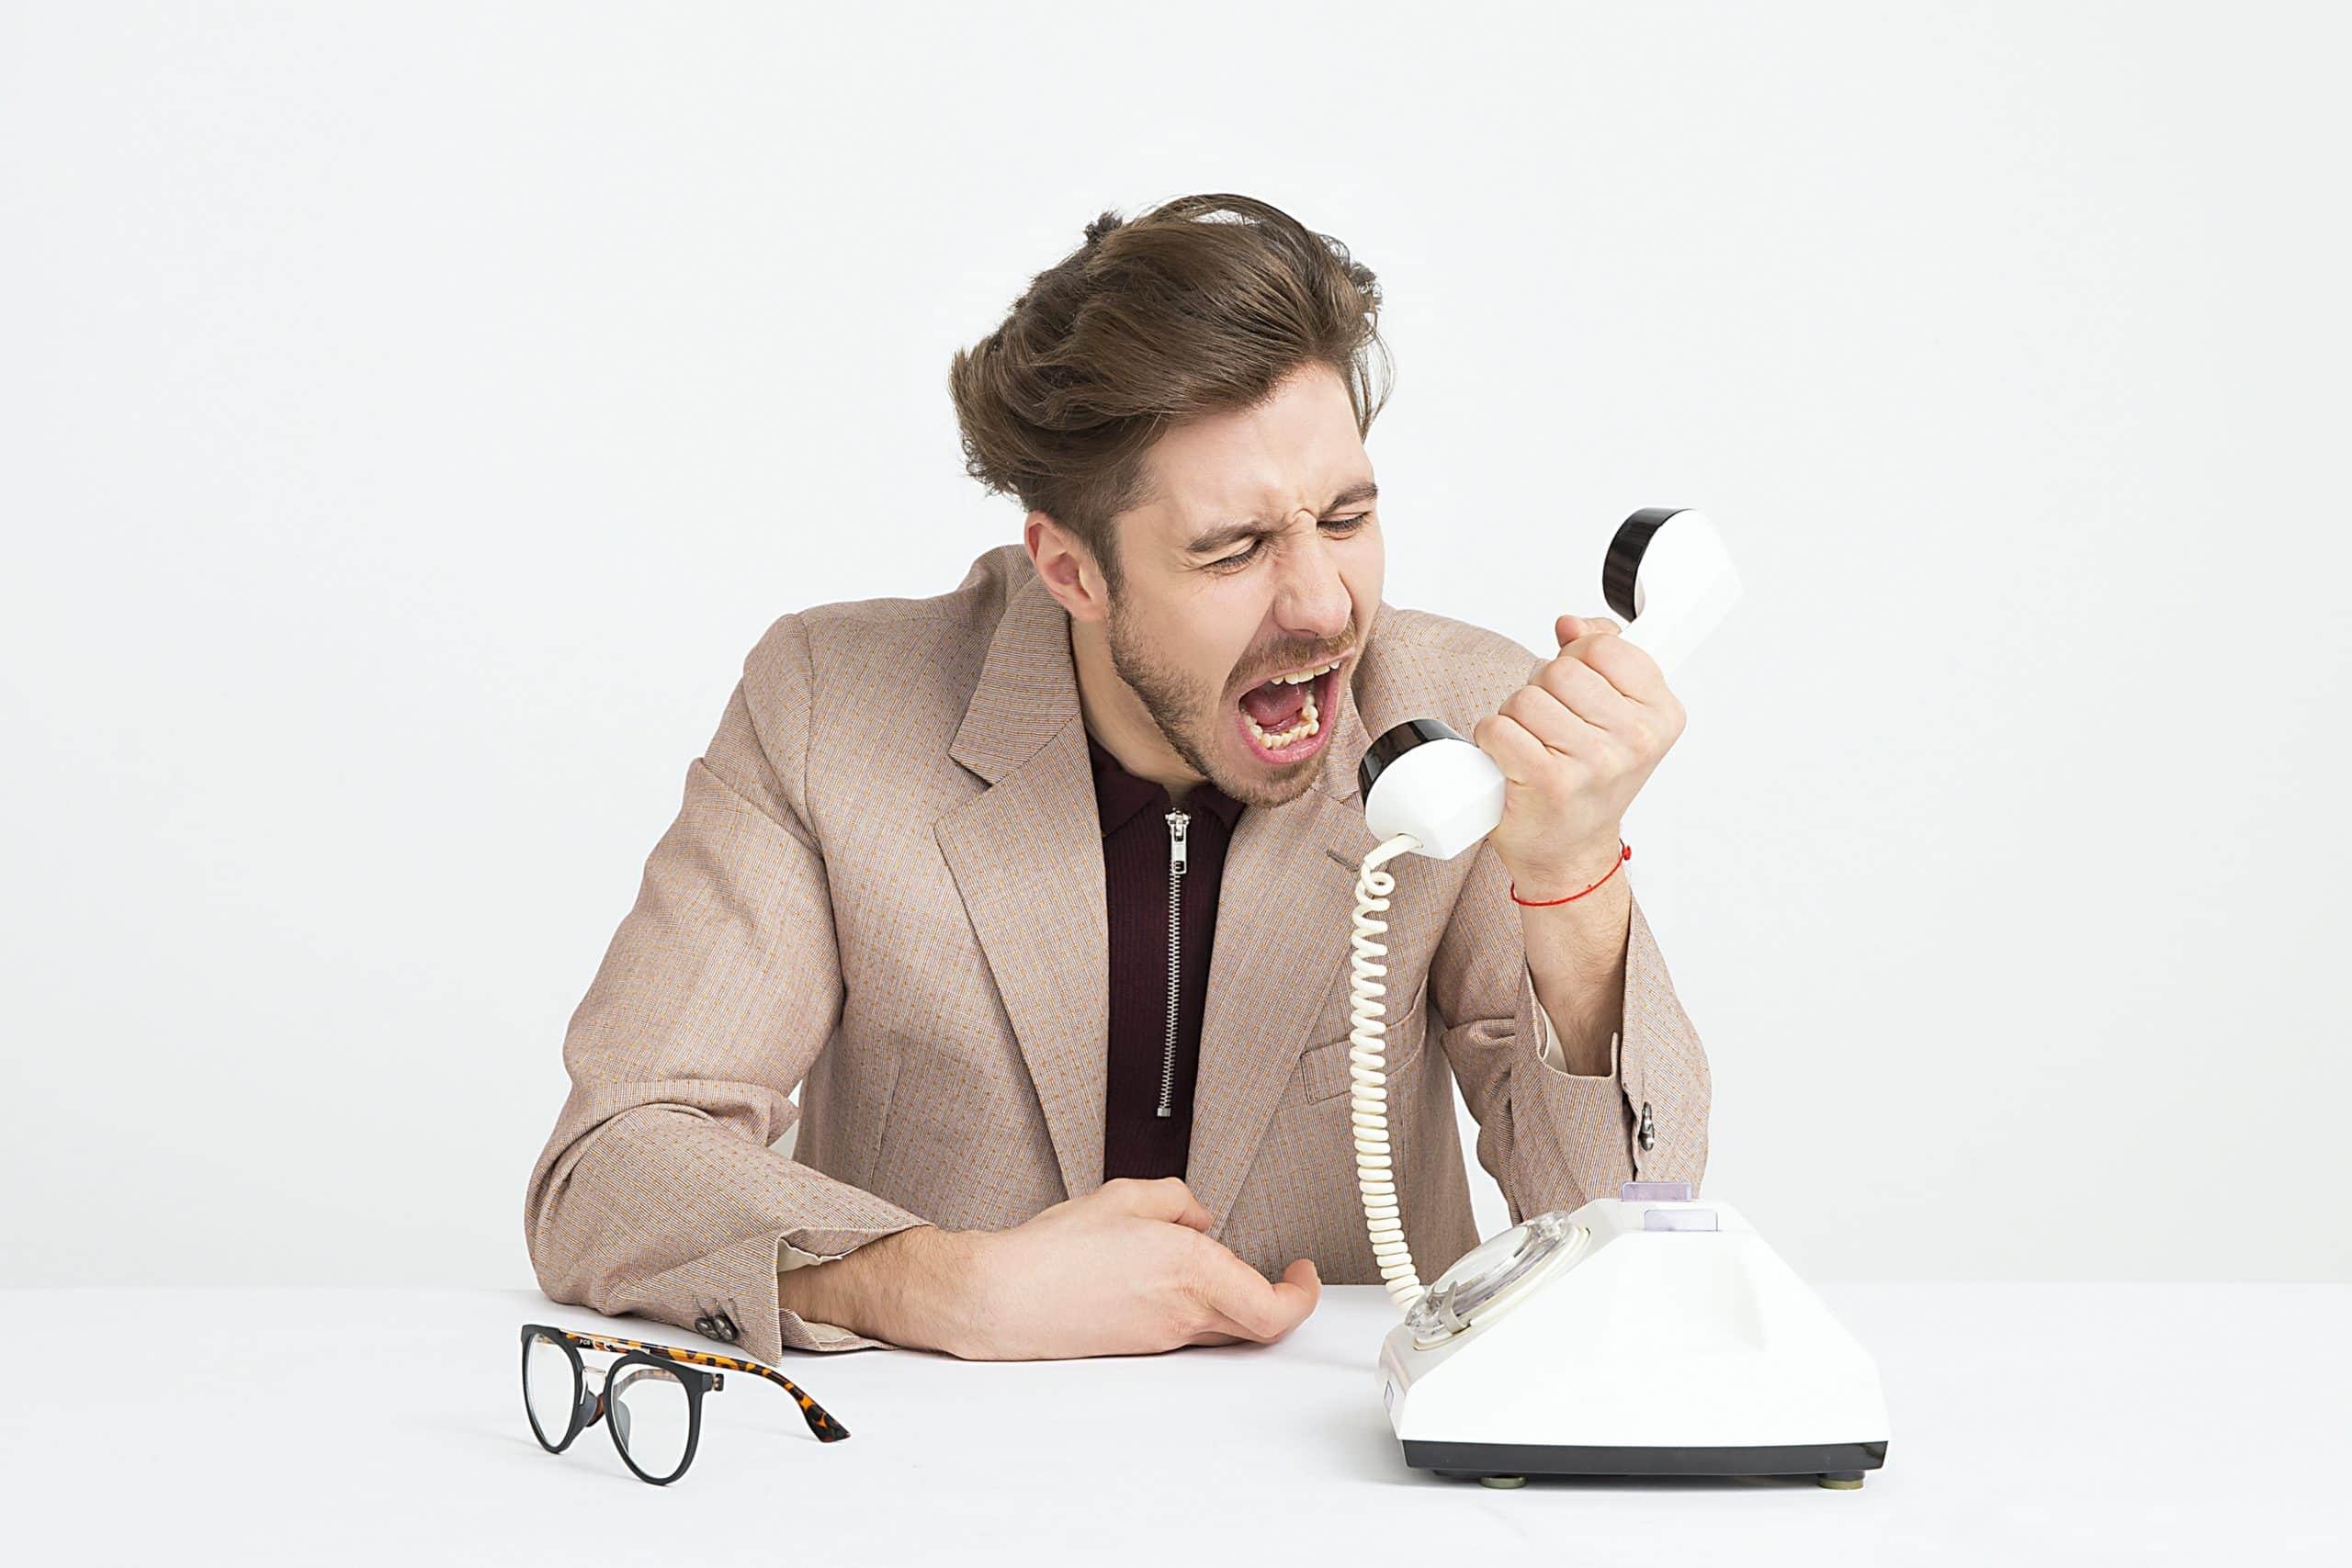 politics in workplace - man yelling